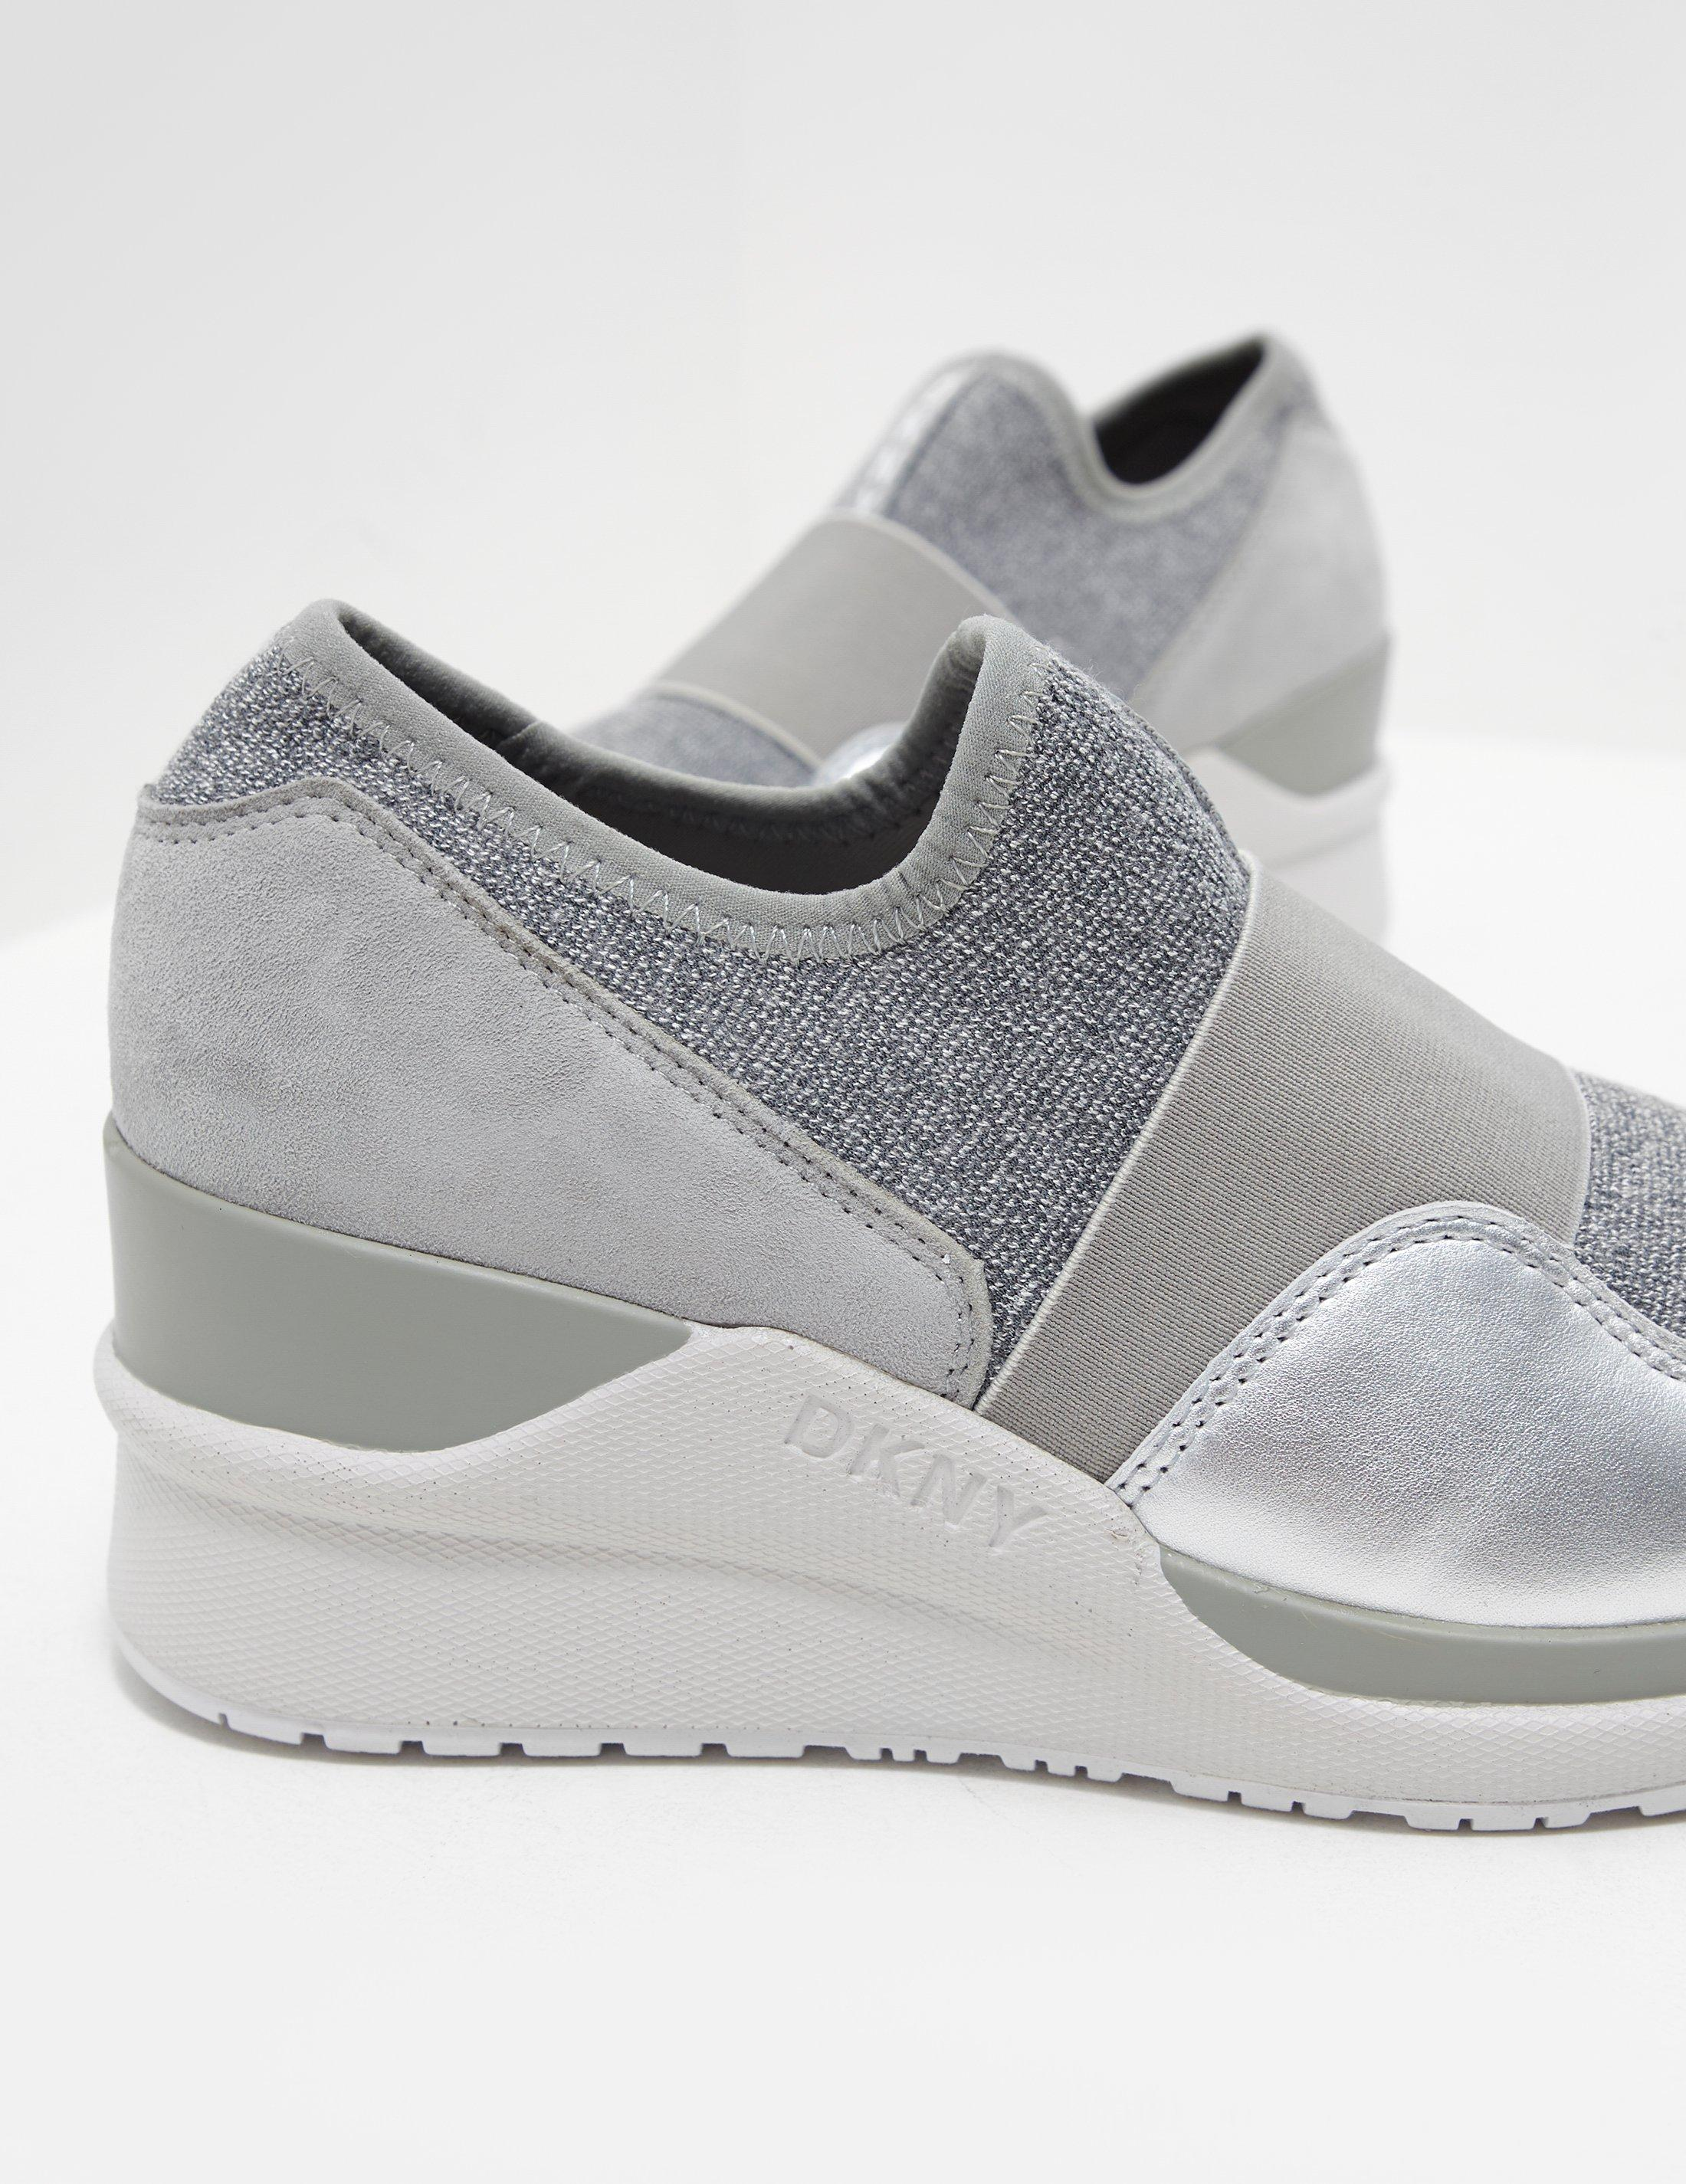 New Womens DKNY Black Amber Slip On Wedge Textile Trainers Sock